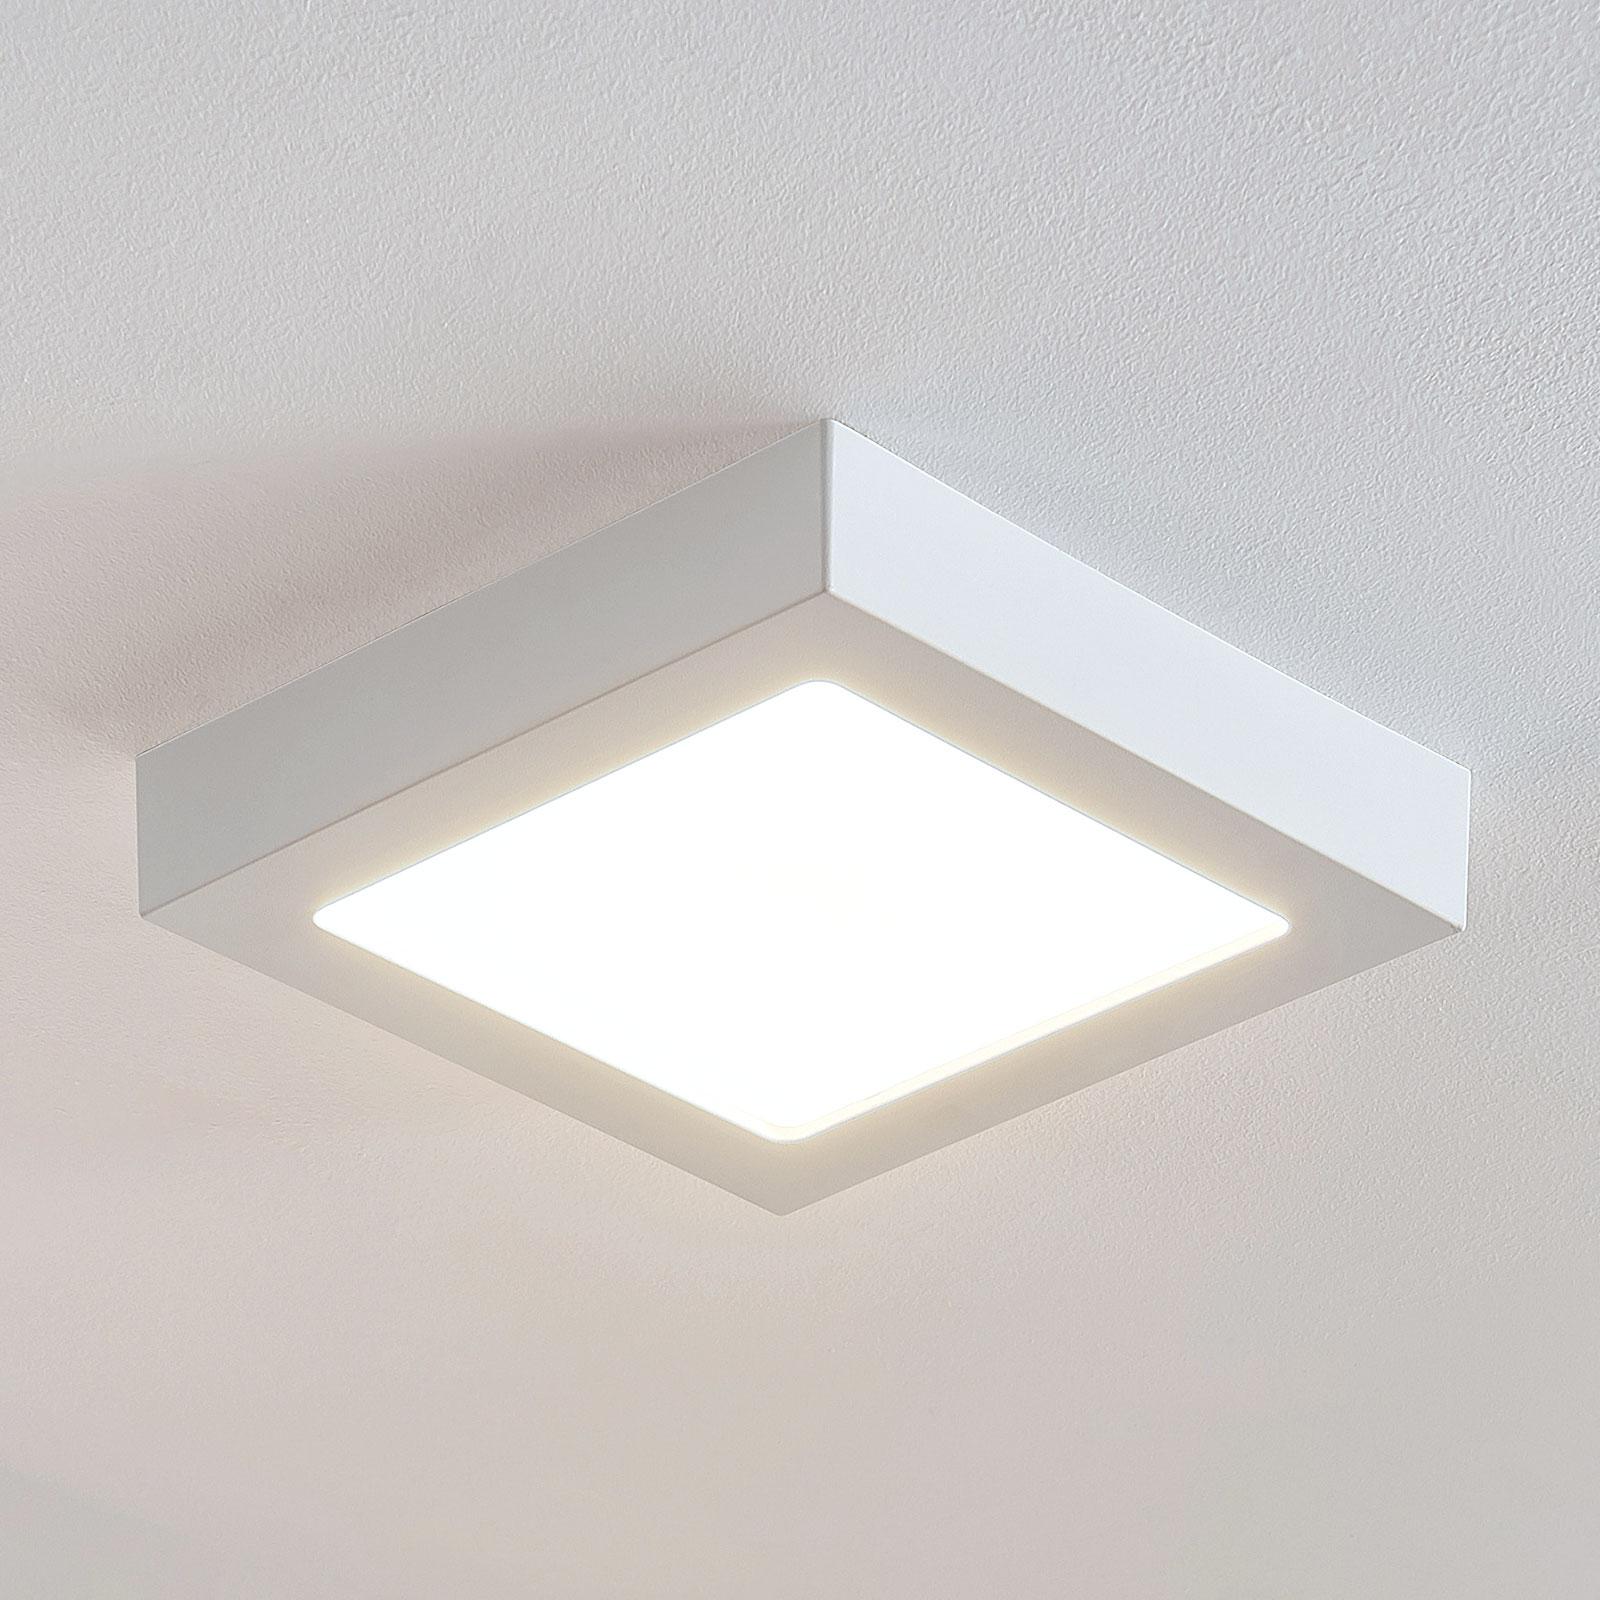 LED-taklampe Marlo, hvit, 3000K kantet 23,1cm